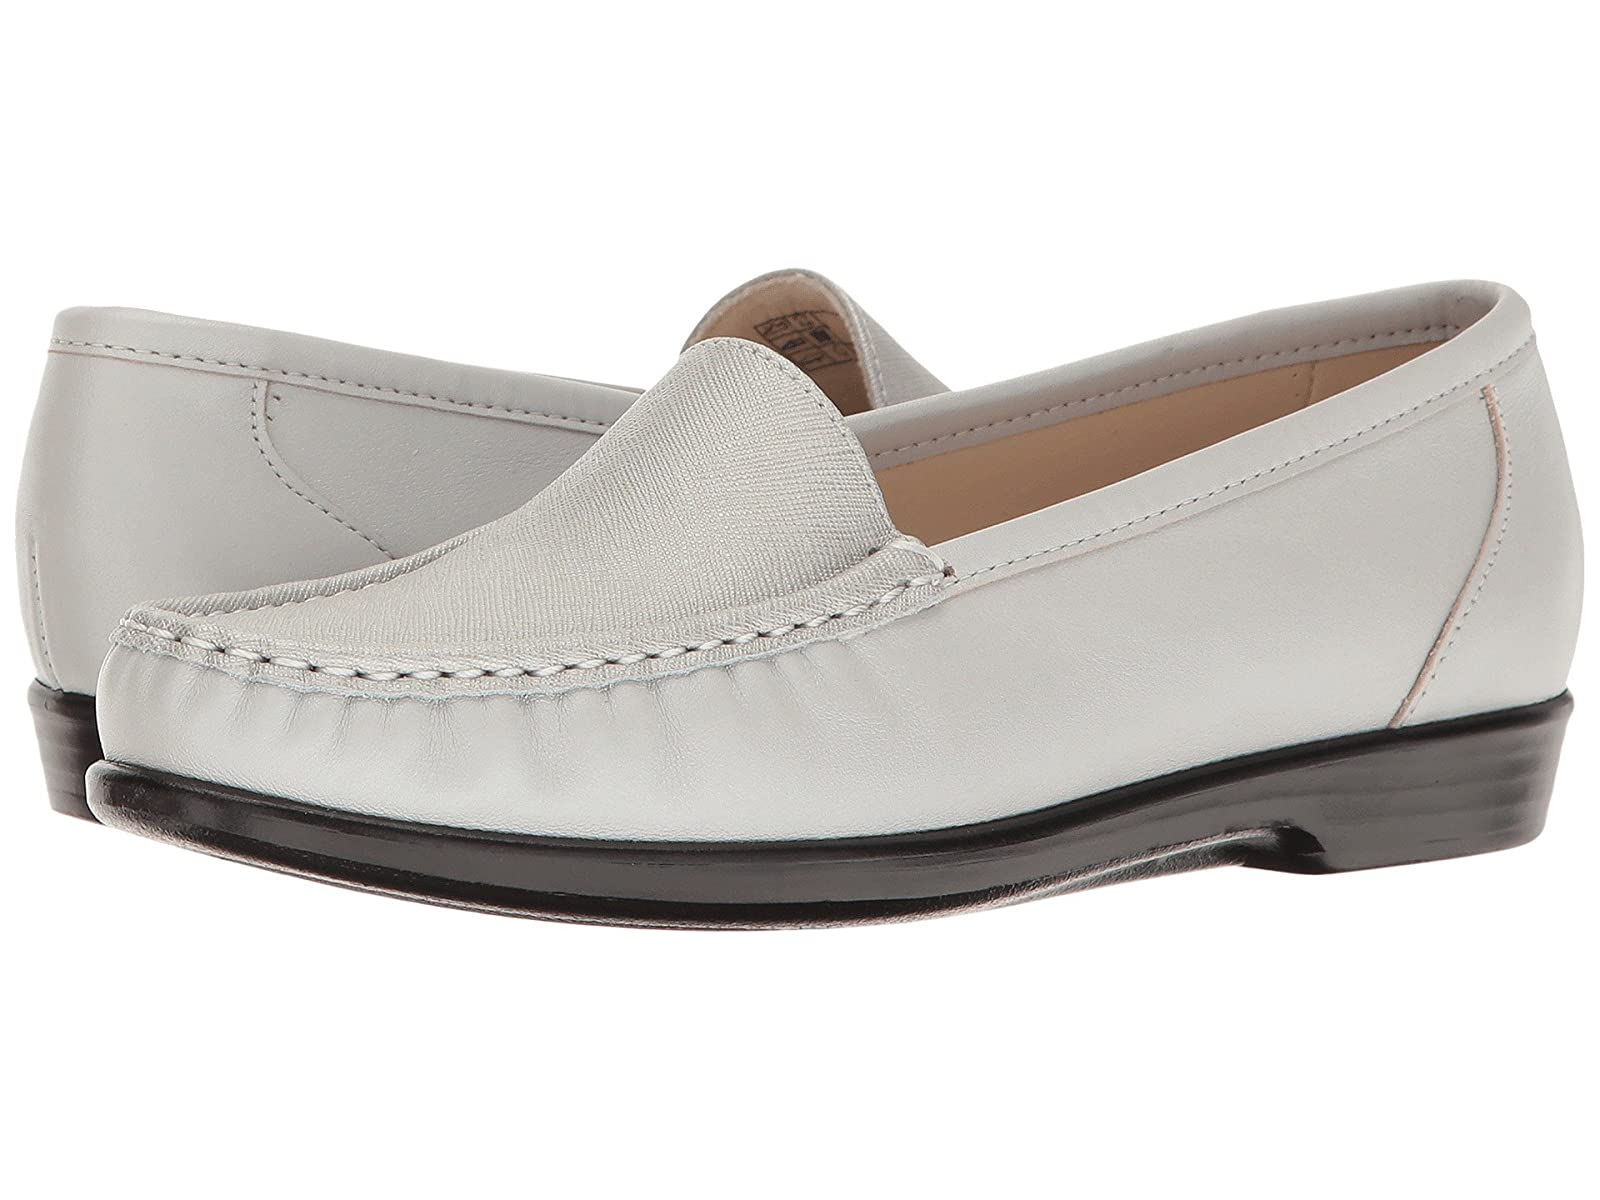 SAS SimplifyAtmospheric grades have affordable shoes